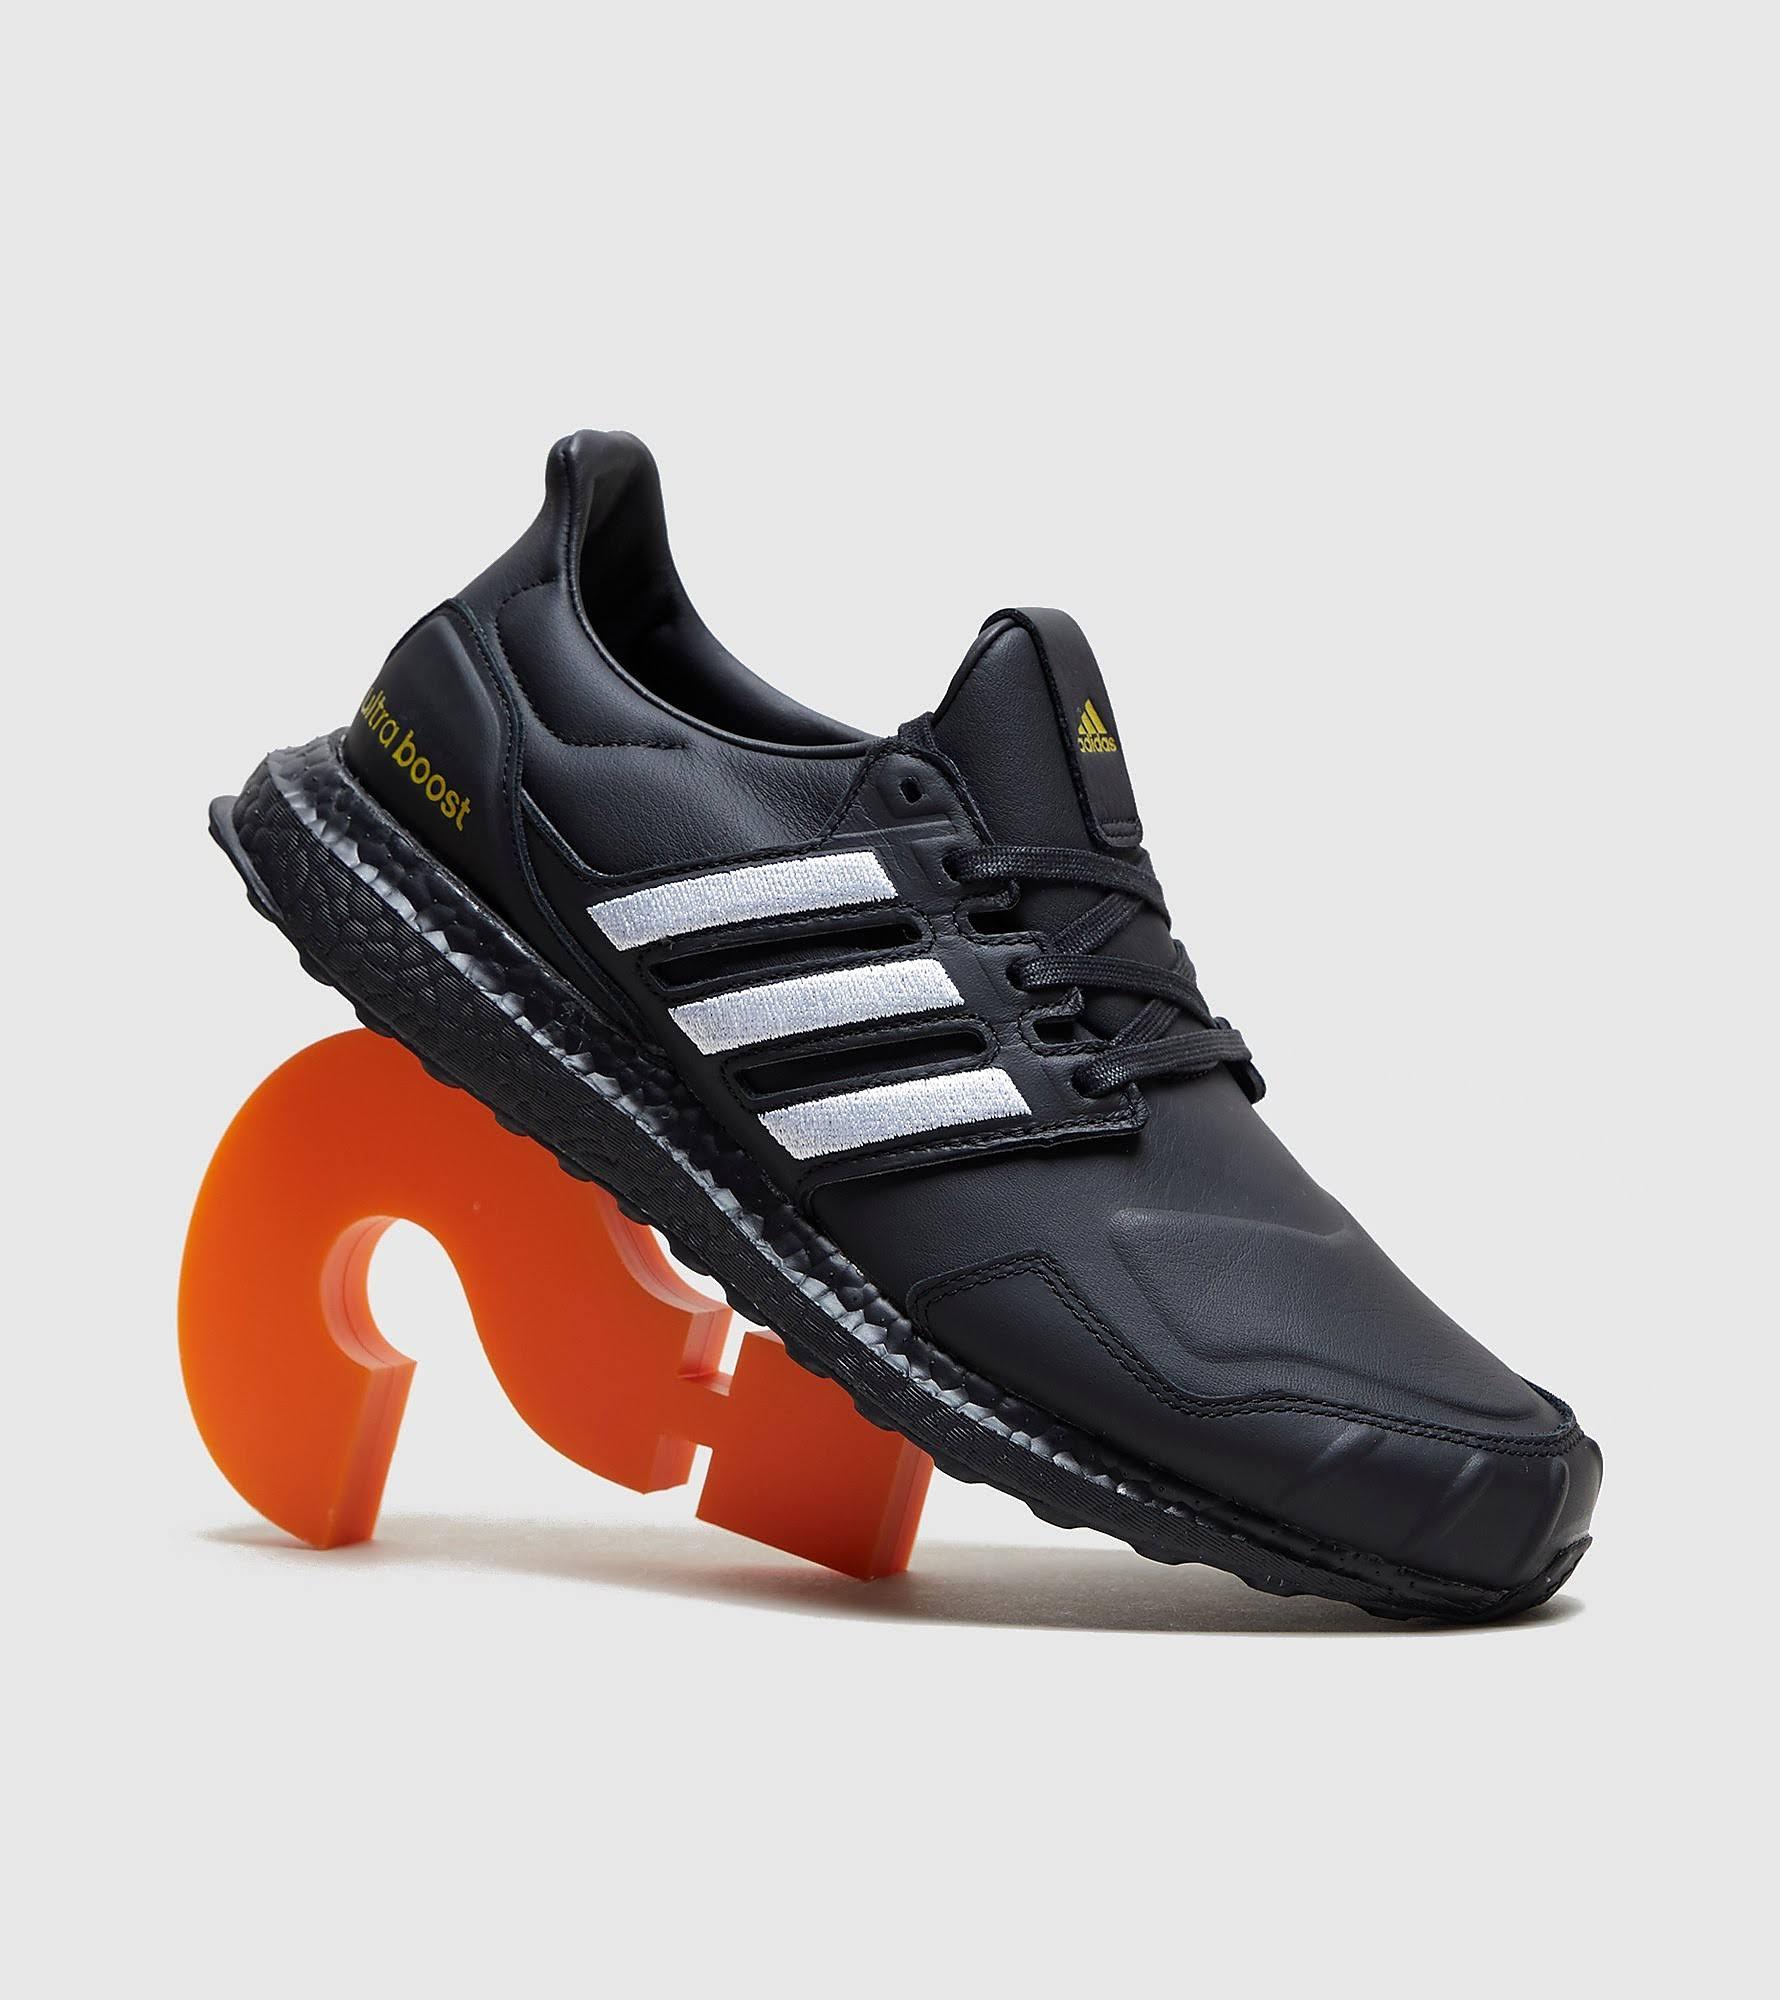 Adidas Ultra Boost DNA, Black - Black - Size: 8